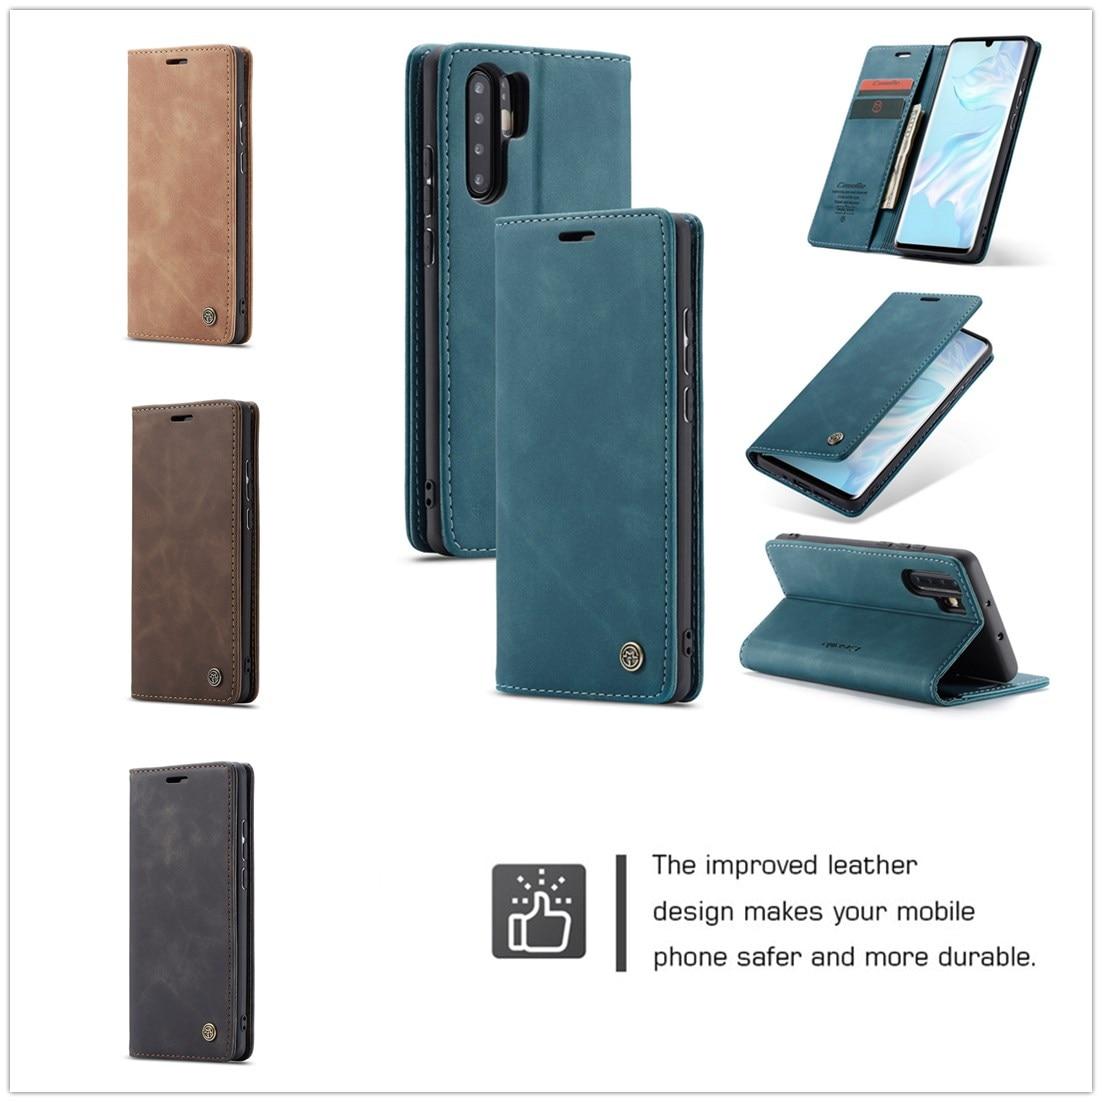 CaseMe for Huawei P30 Case Solid Color Retro Leather Pro Luxury Card Slot Magnetic Lite Flip Pu Wallet